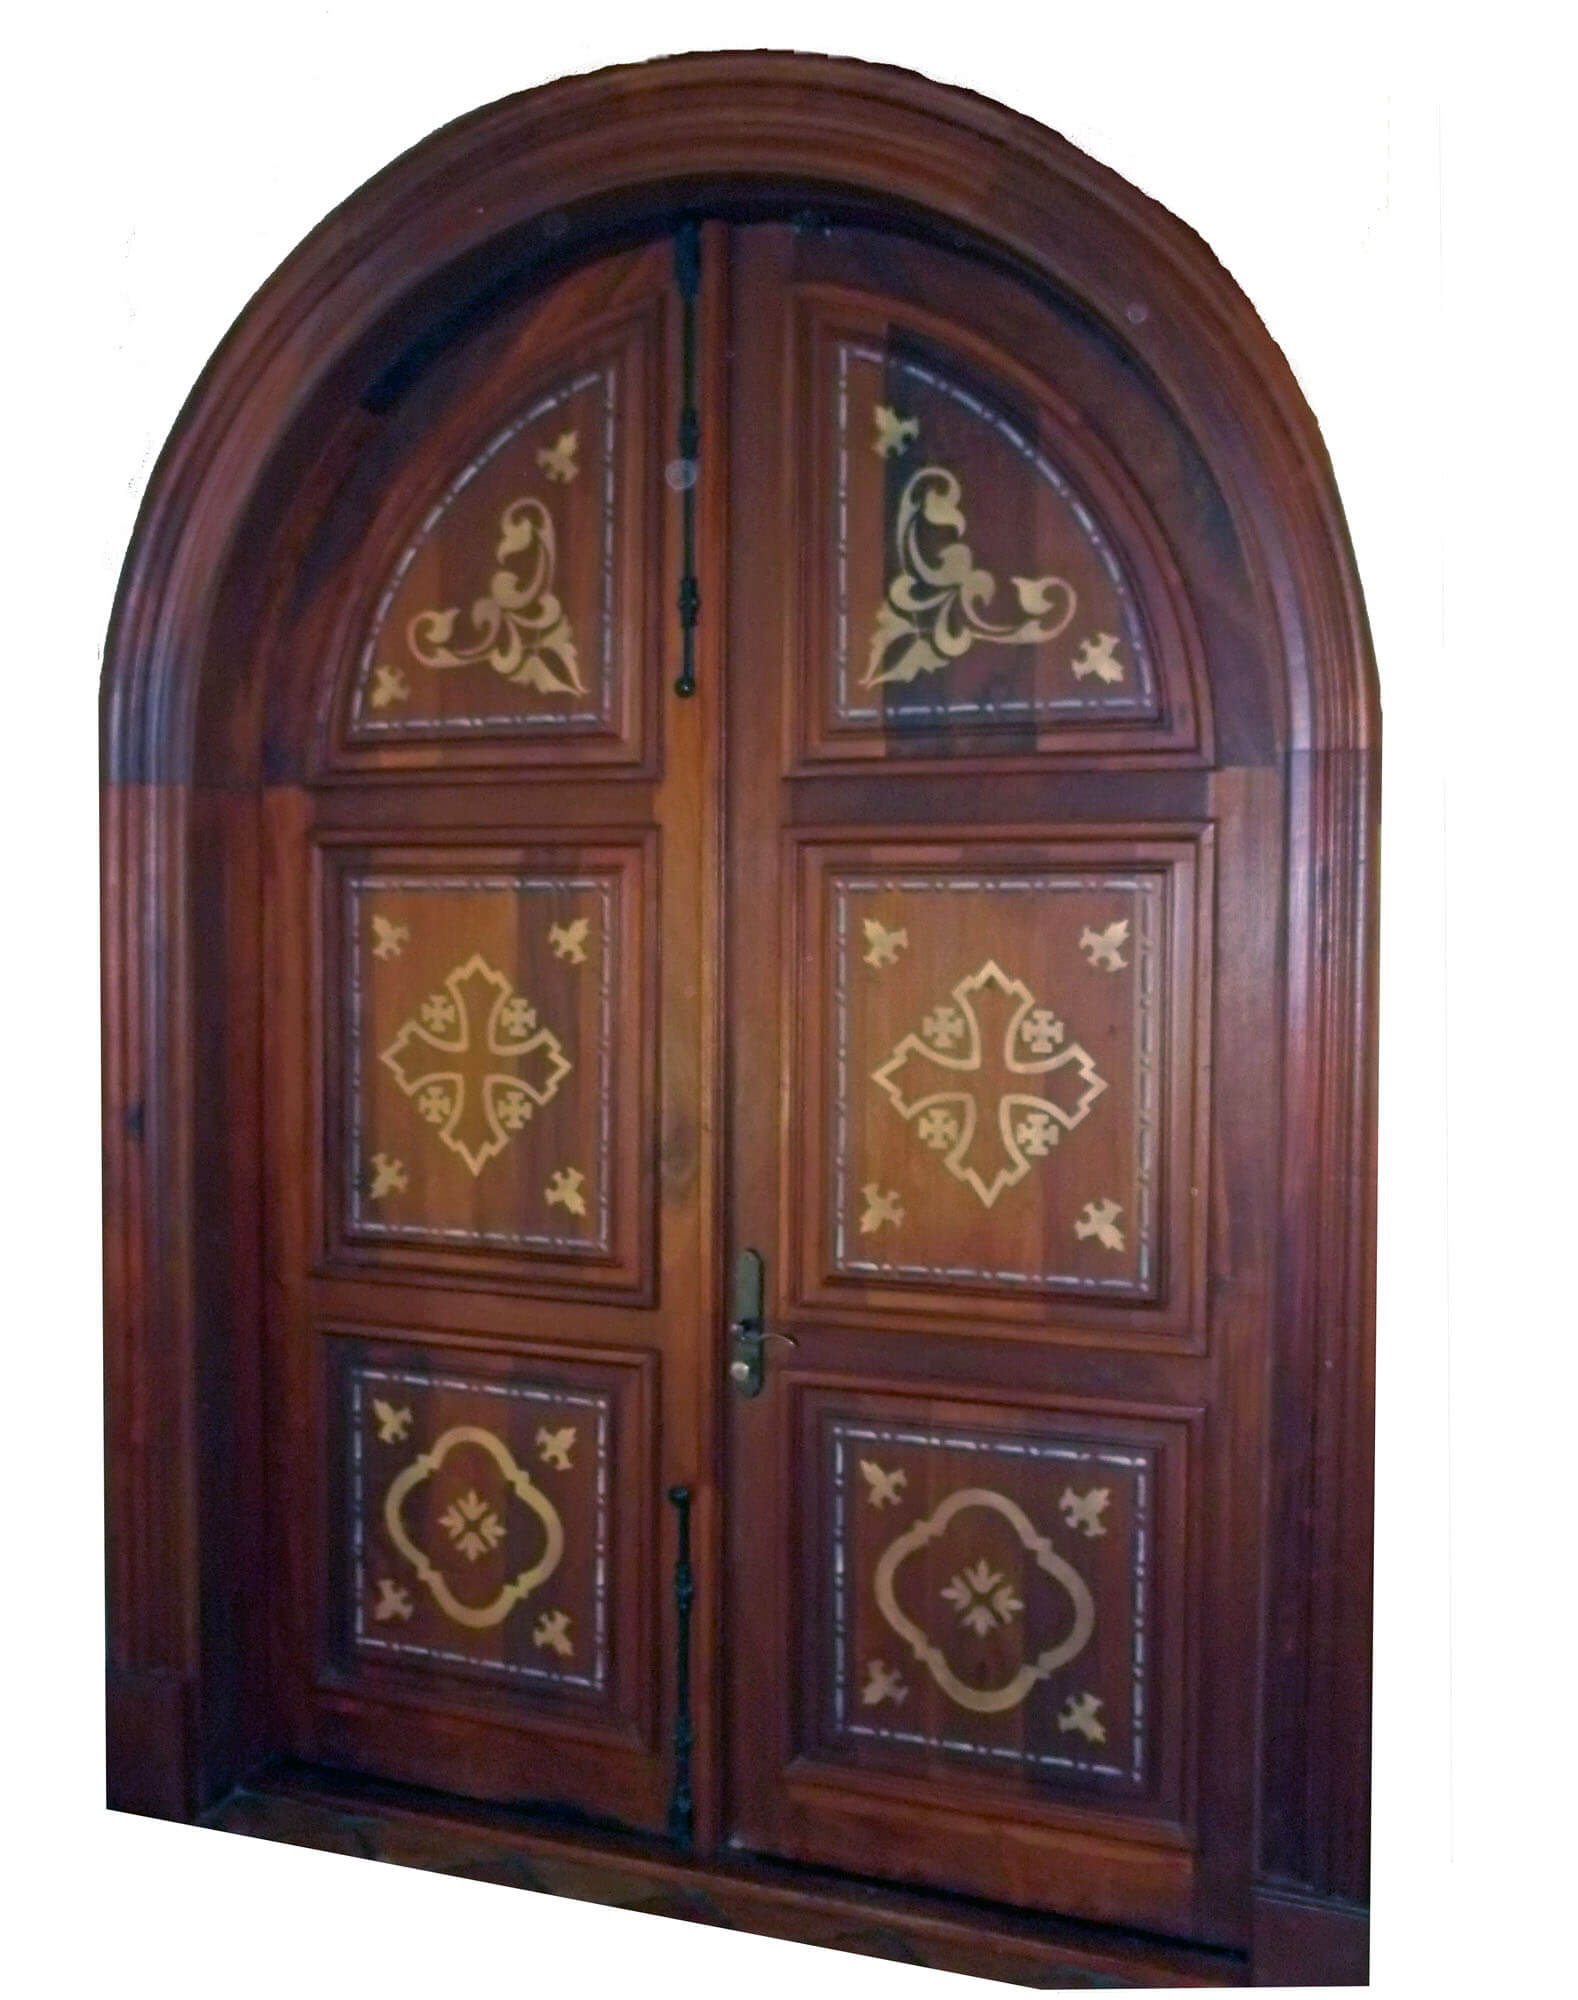 KENDALL MAHOGANY ENTRY DOOR INTERIOR VIEW.